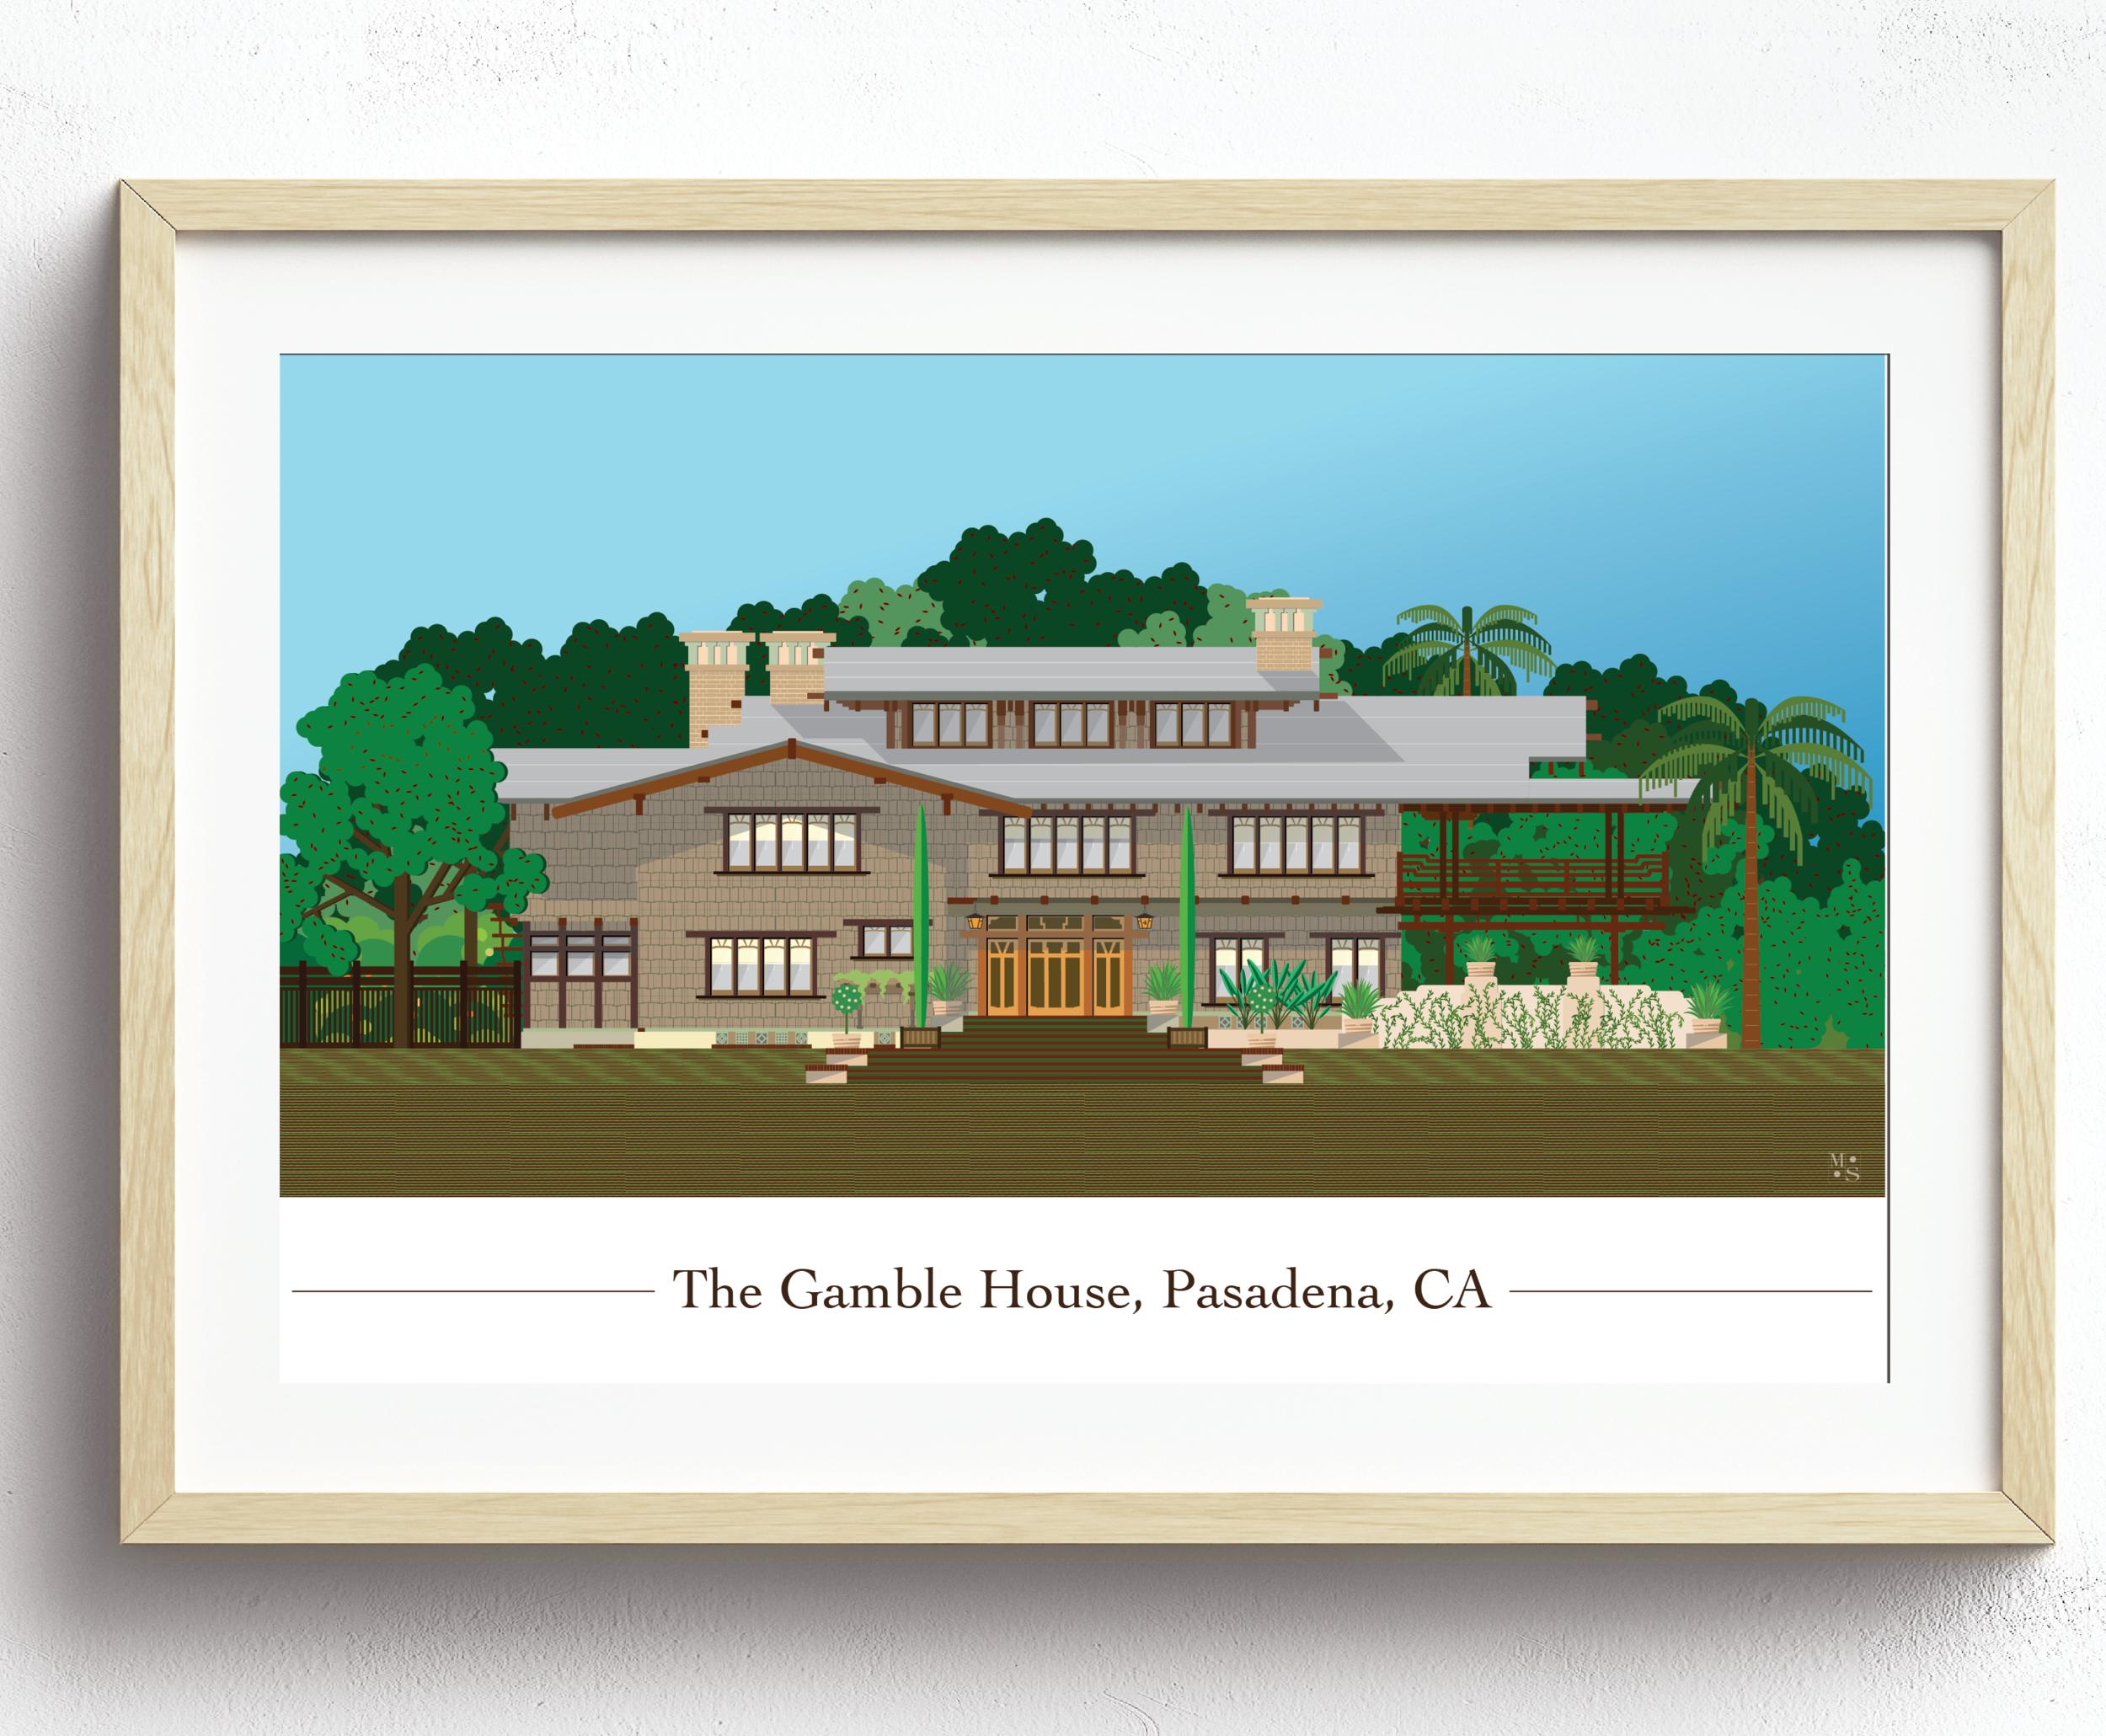 The Gamble House, Pasadena, CA by MarioSiART